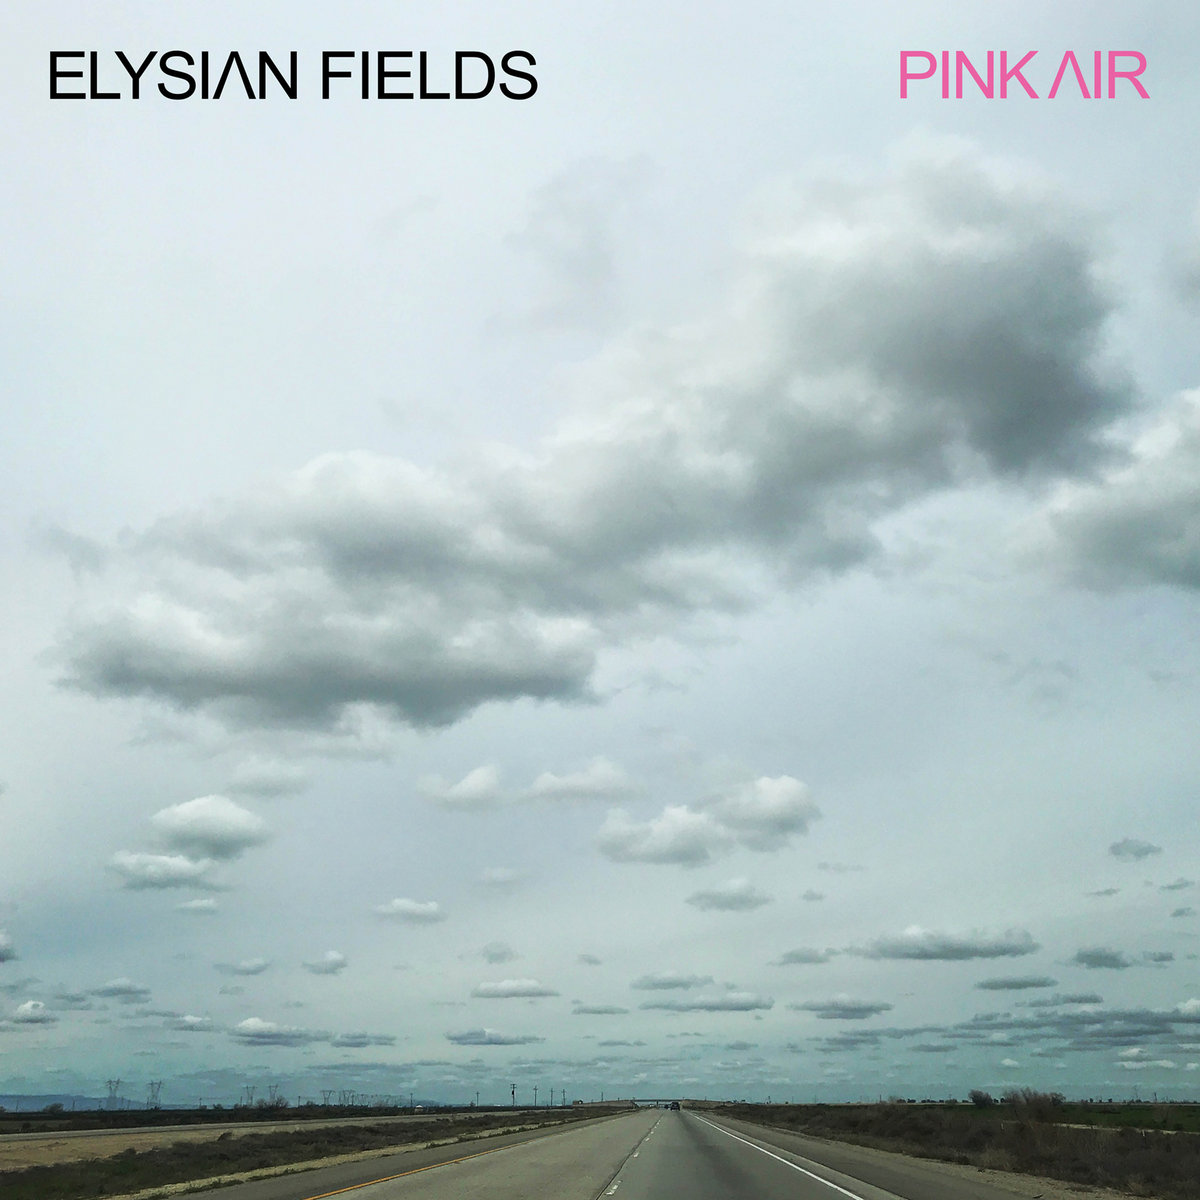 Elysian Fields Pink Air